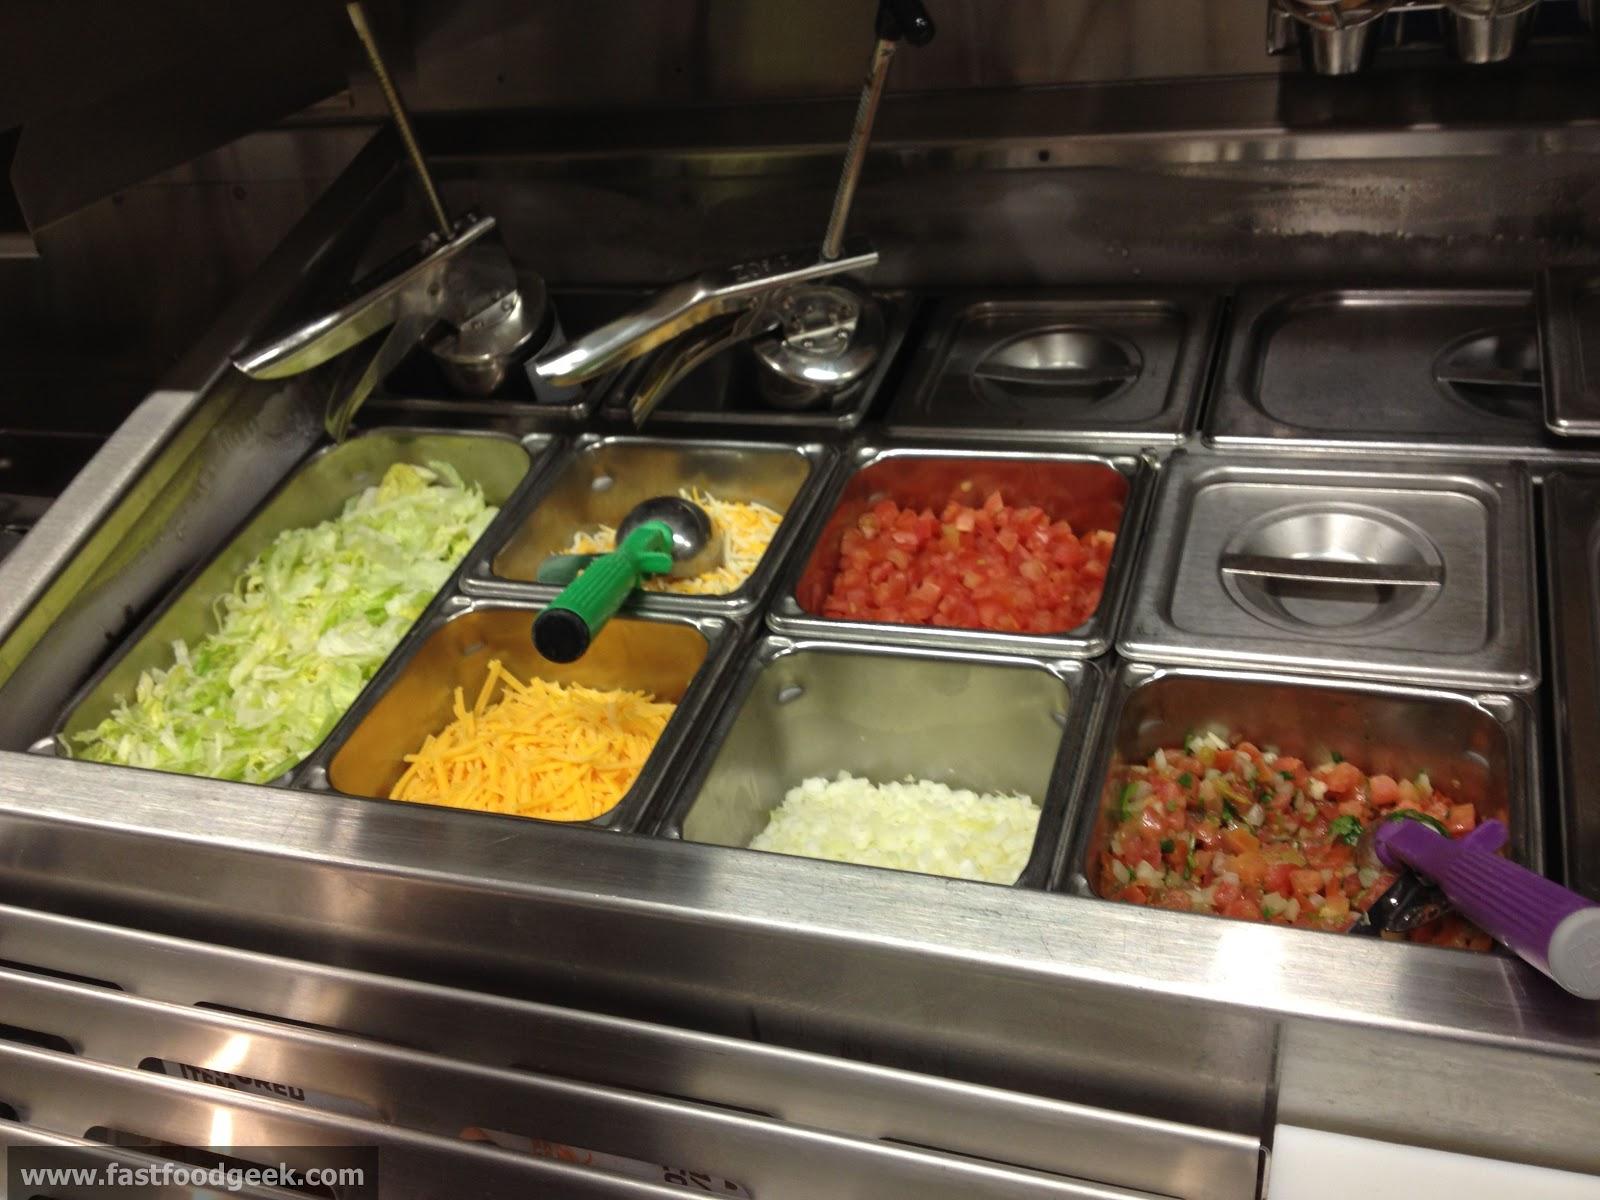 Taco Bell Kitchen special report: taco bell doritos locos taco sneak peek [part 3